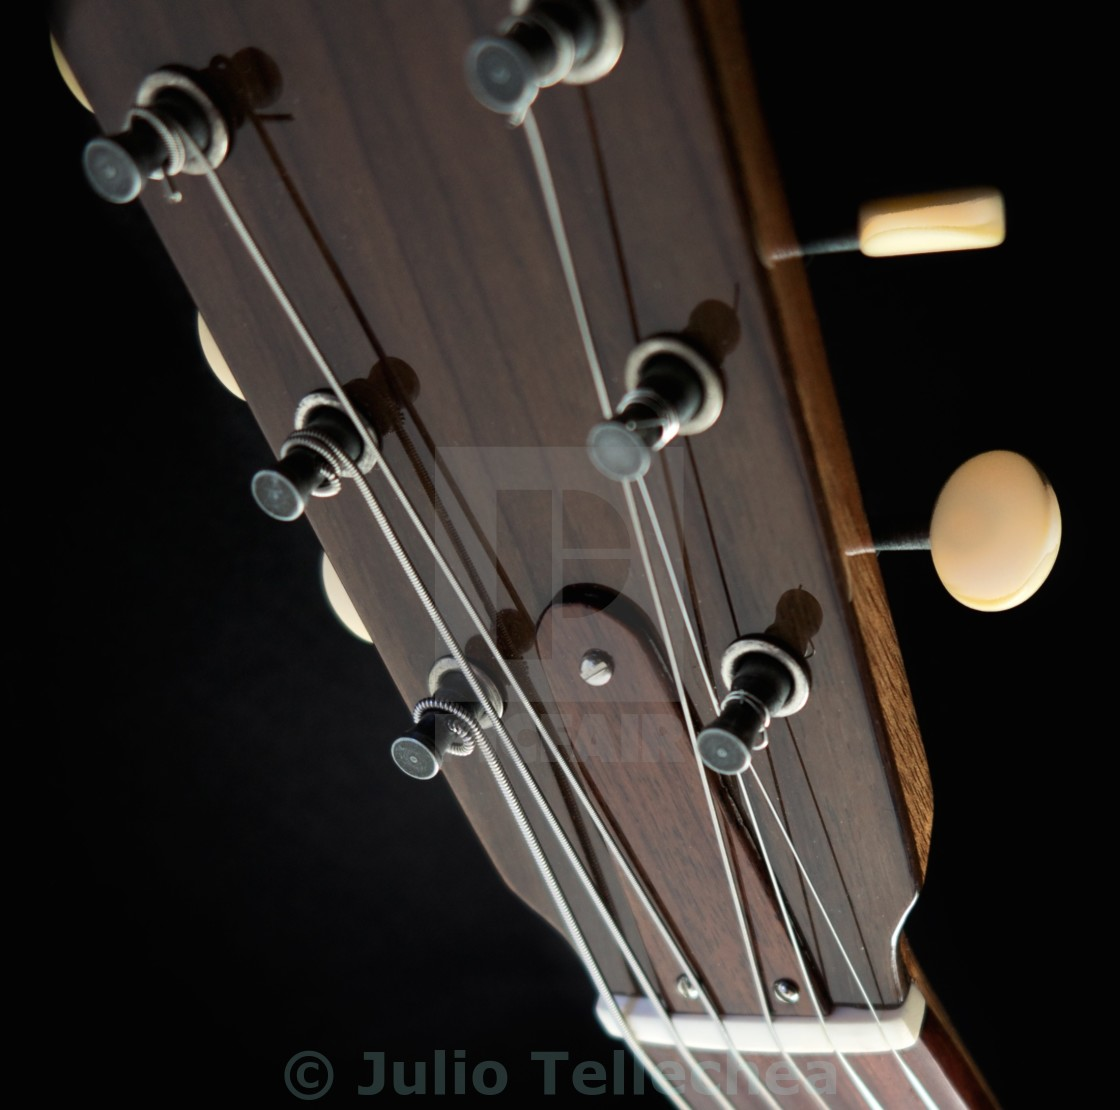 """guitar detail Vl"" stock image"